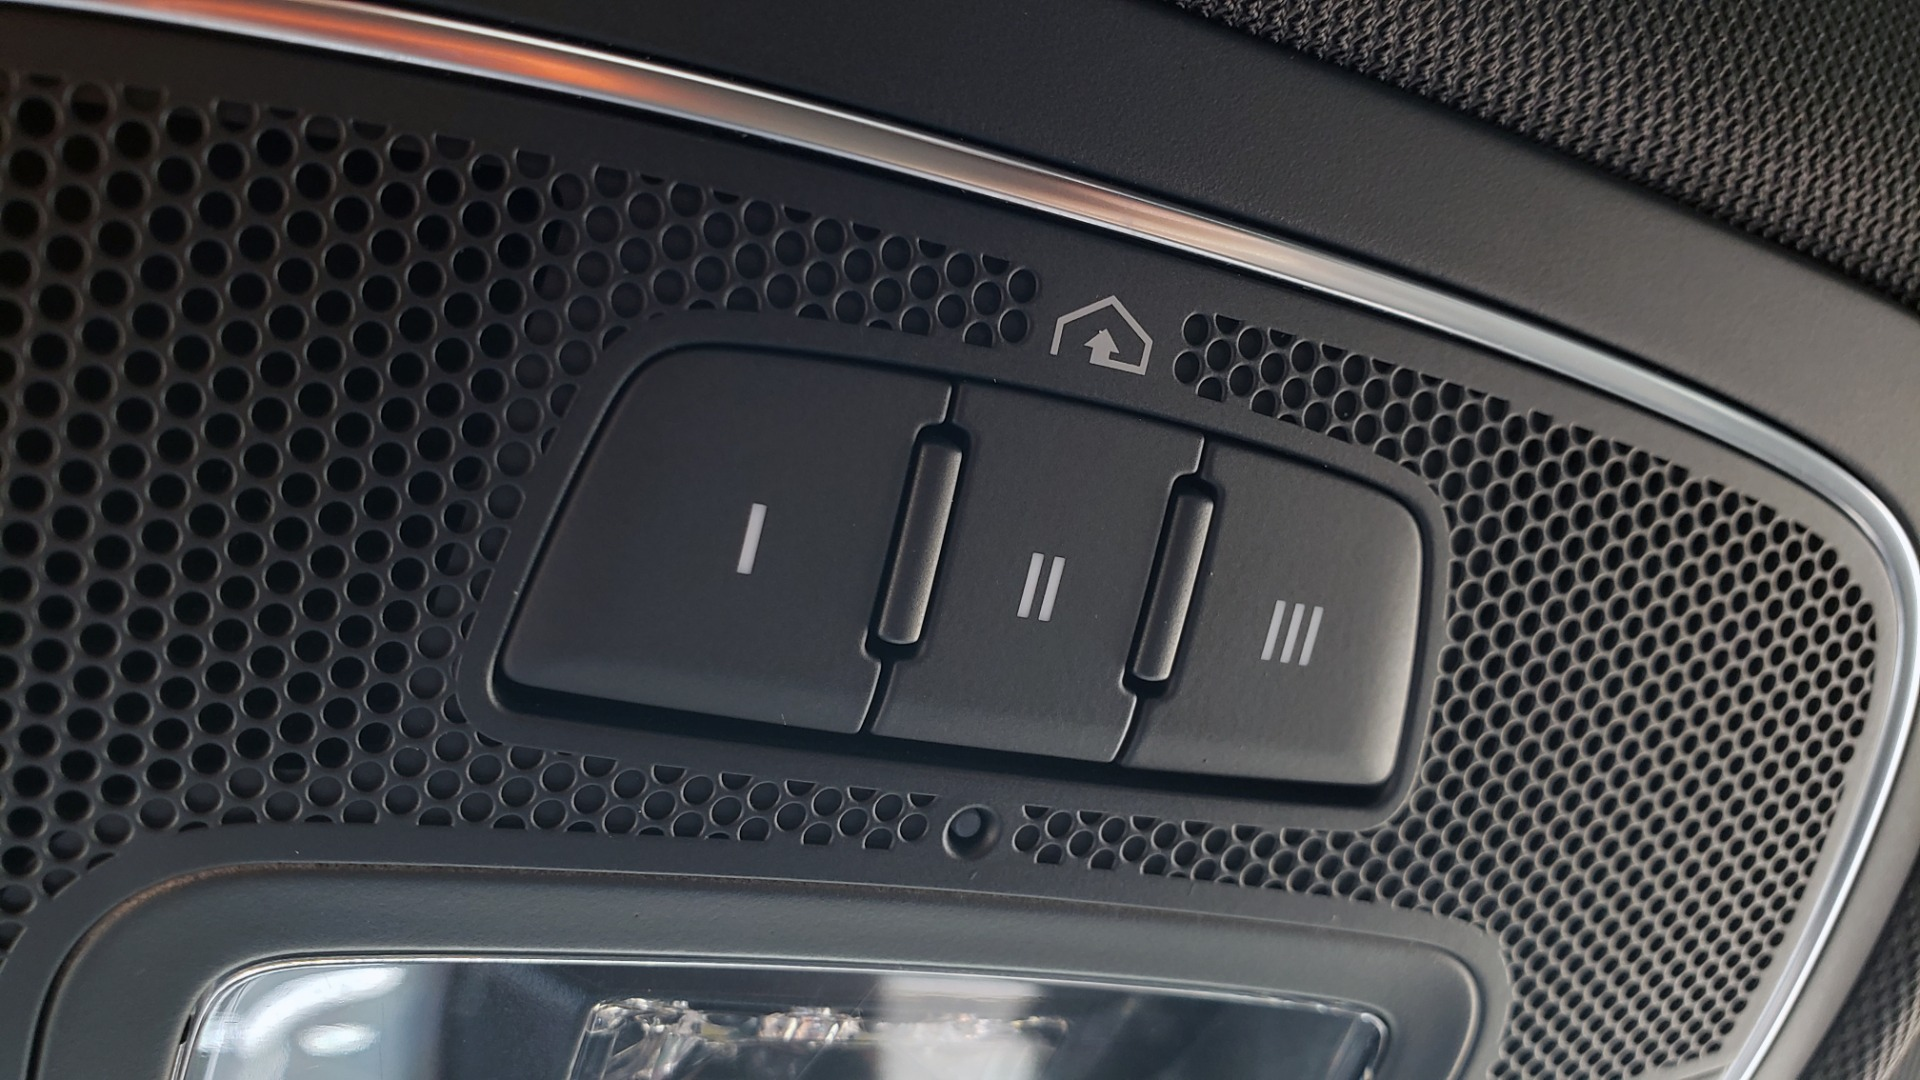 Used 2017 Audi A6 PRESTIGE SEDAN 3.0T / NAV / SUNROOF / BLACK OPTIC / CLD WTHR / REARVIEW for sale $30,797 at Formula Imports in Charlotte NC 28227 58